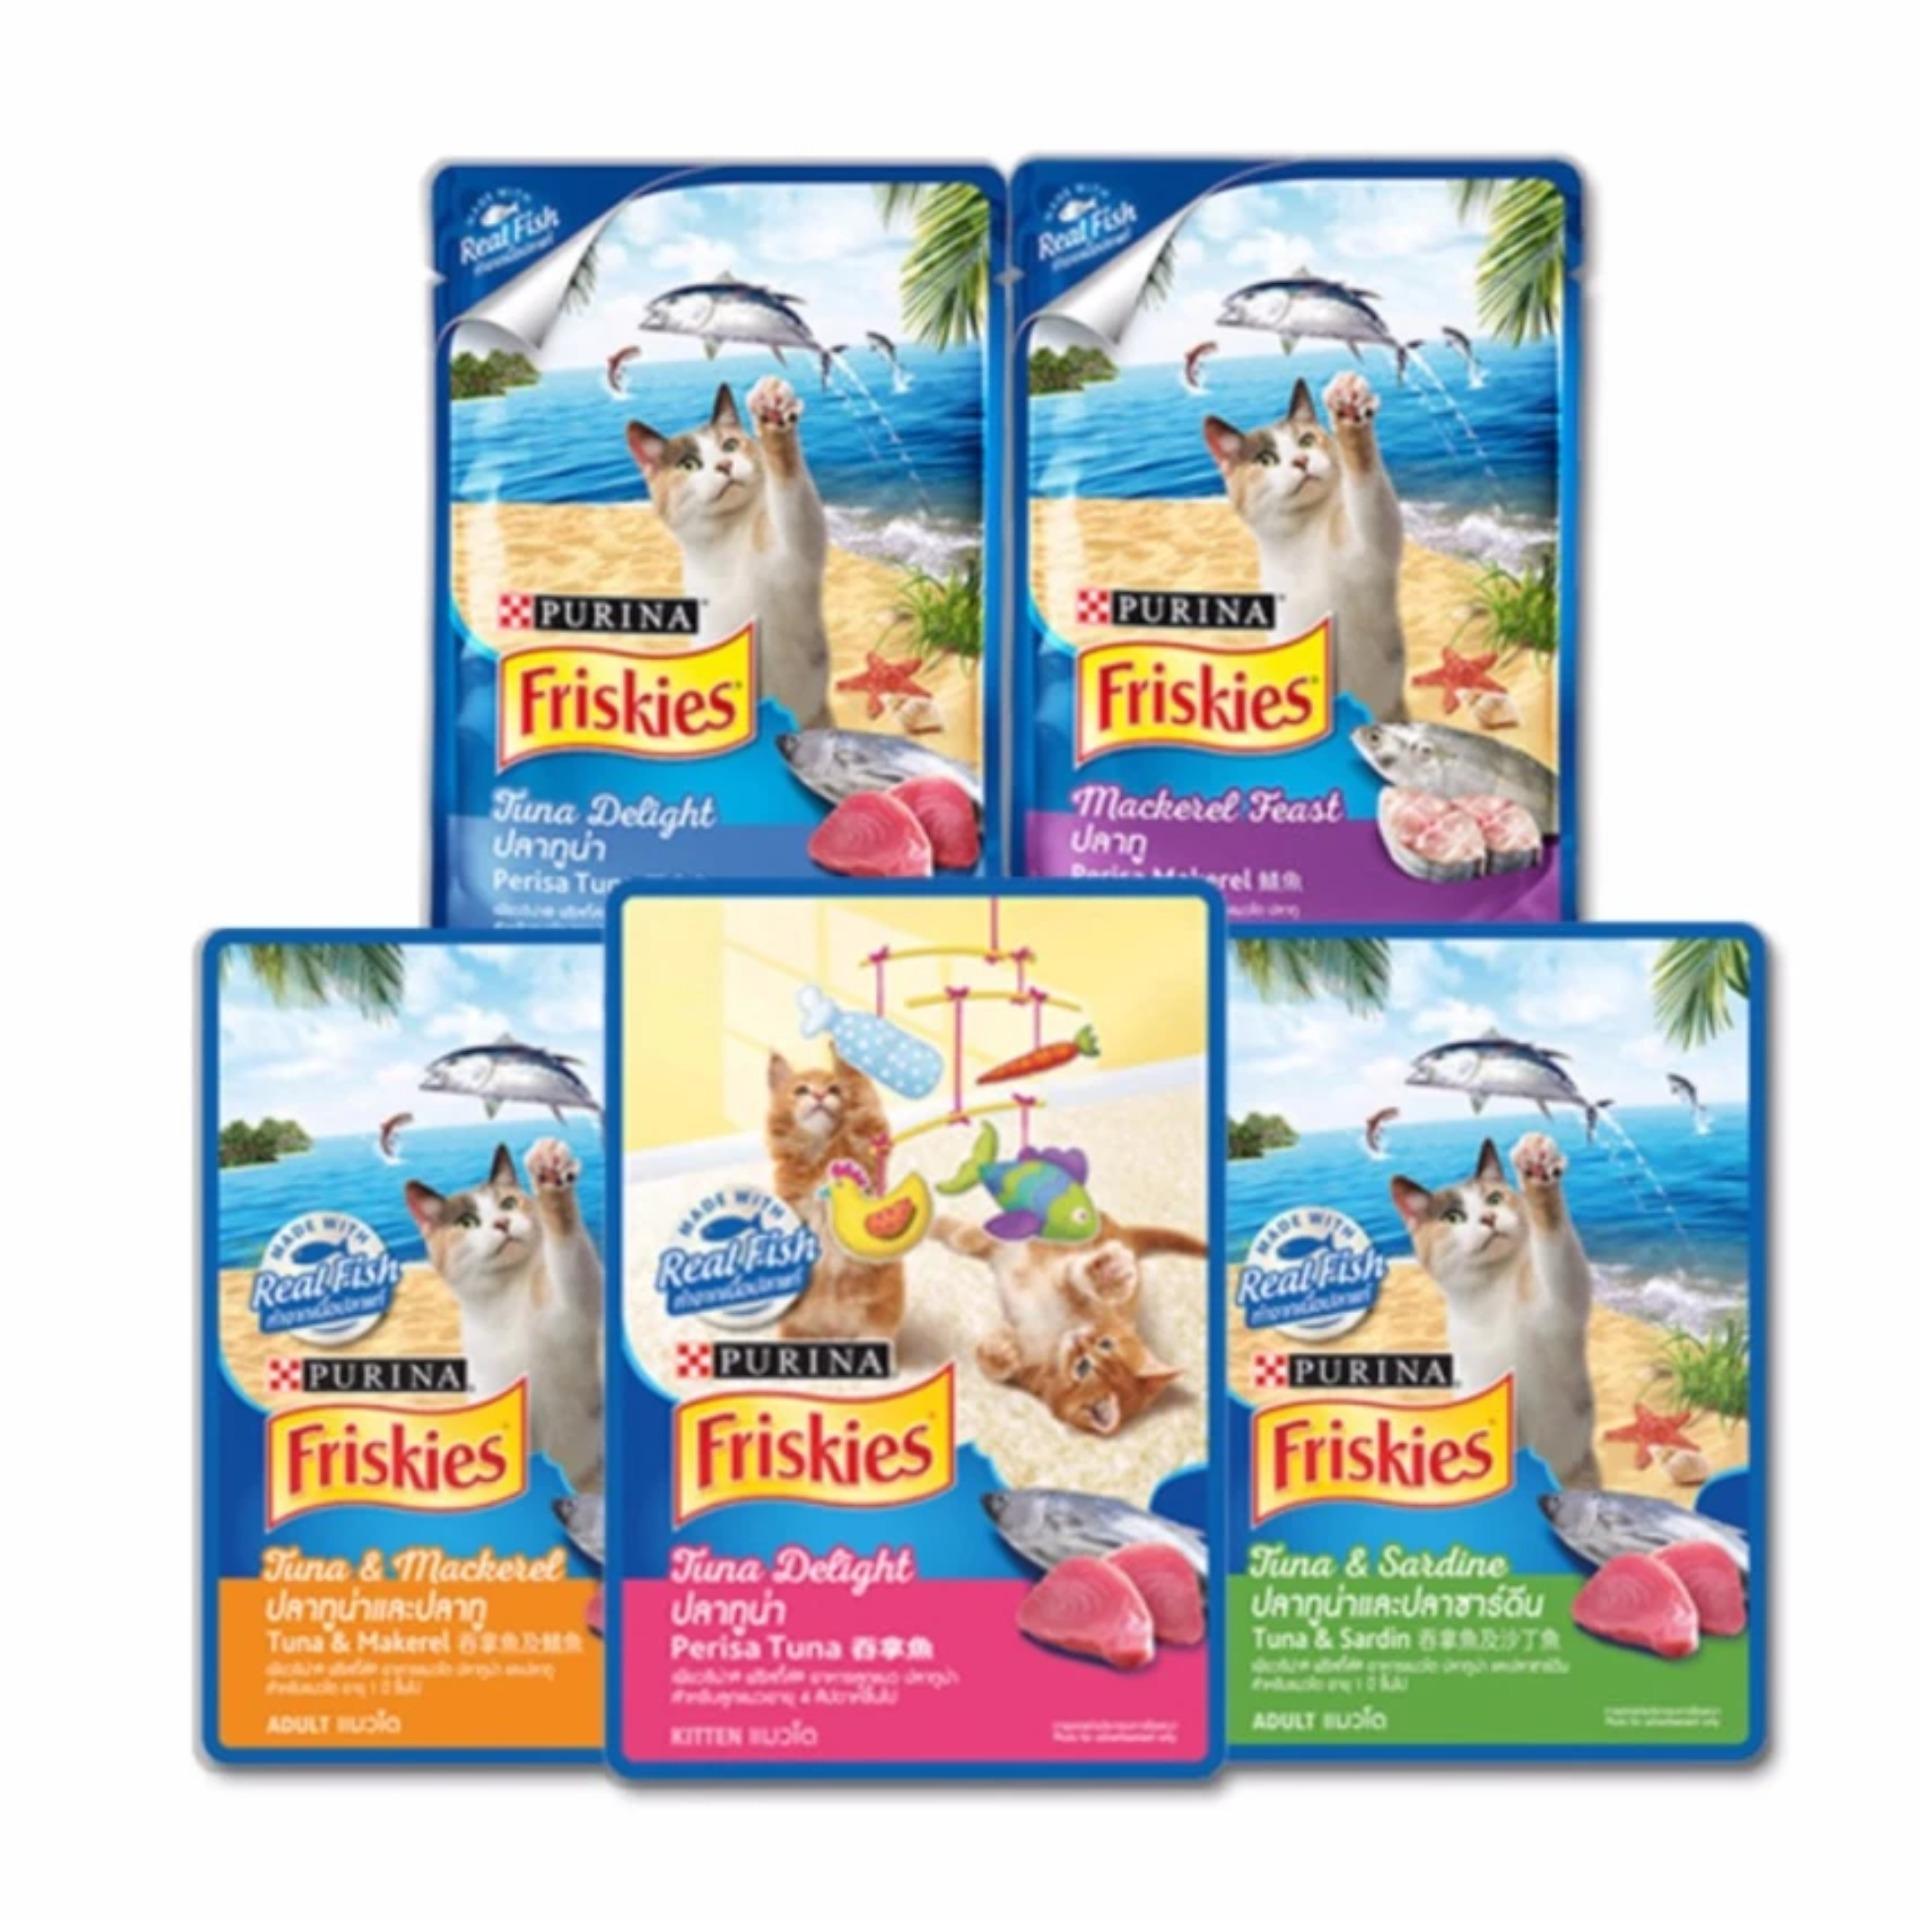 Friskies Wet Pouch X 5 Pcs Random Indonesia Isi 24 Pack Whiskas 85gr Makanan Kucing Rasa Grilled Saba Rumah